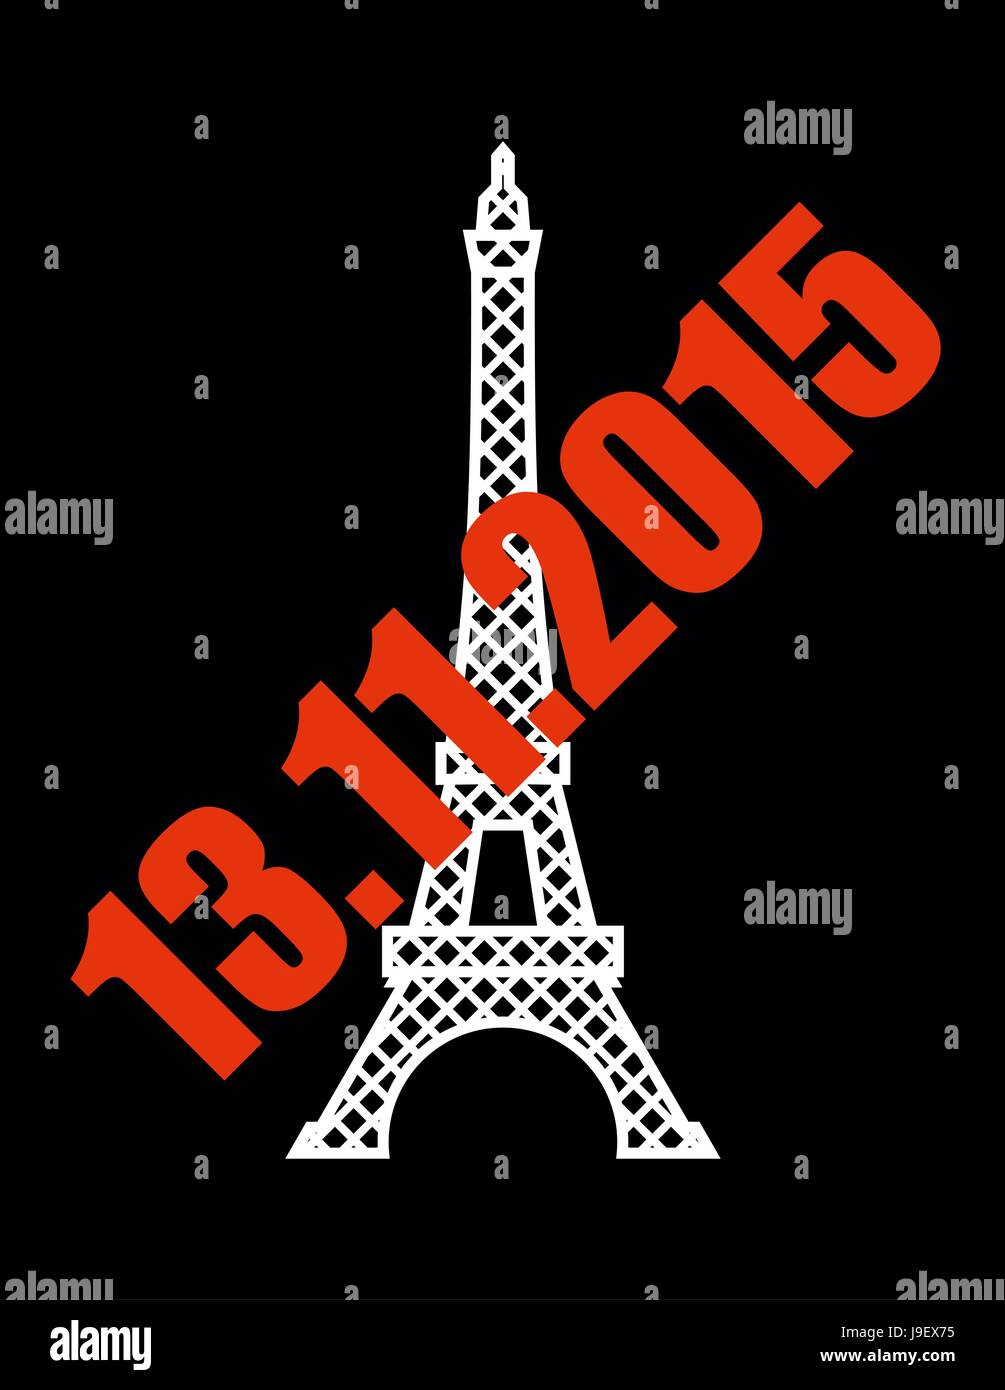 13 November 2015 Terrorist Attack In Paris National Symbol Of